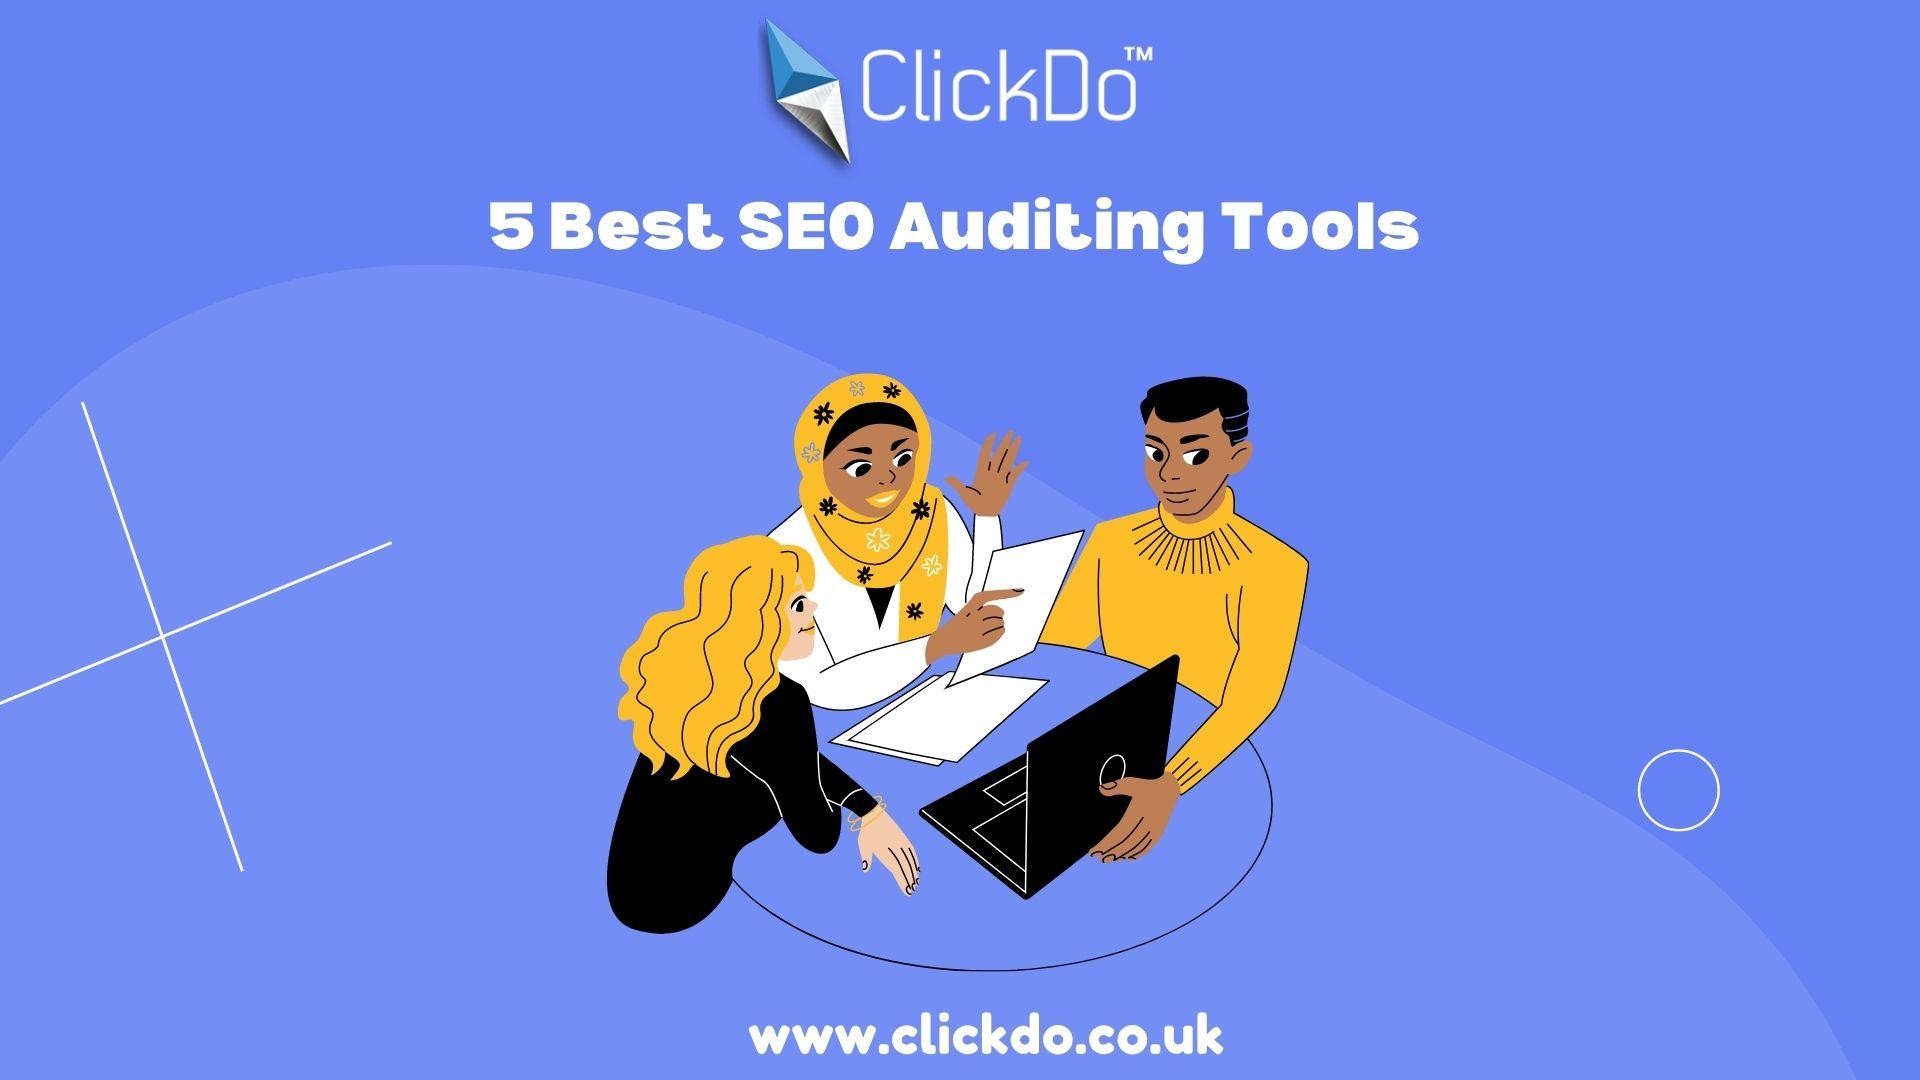 5 Best SEO Auditing Tools